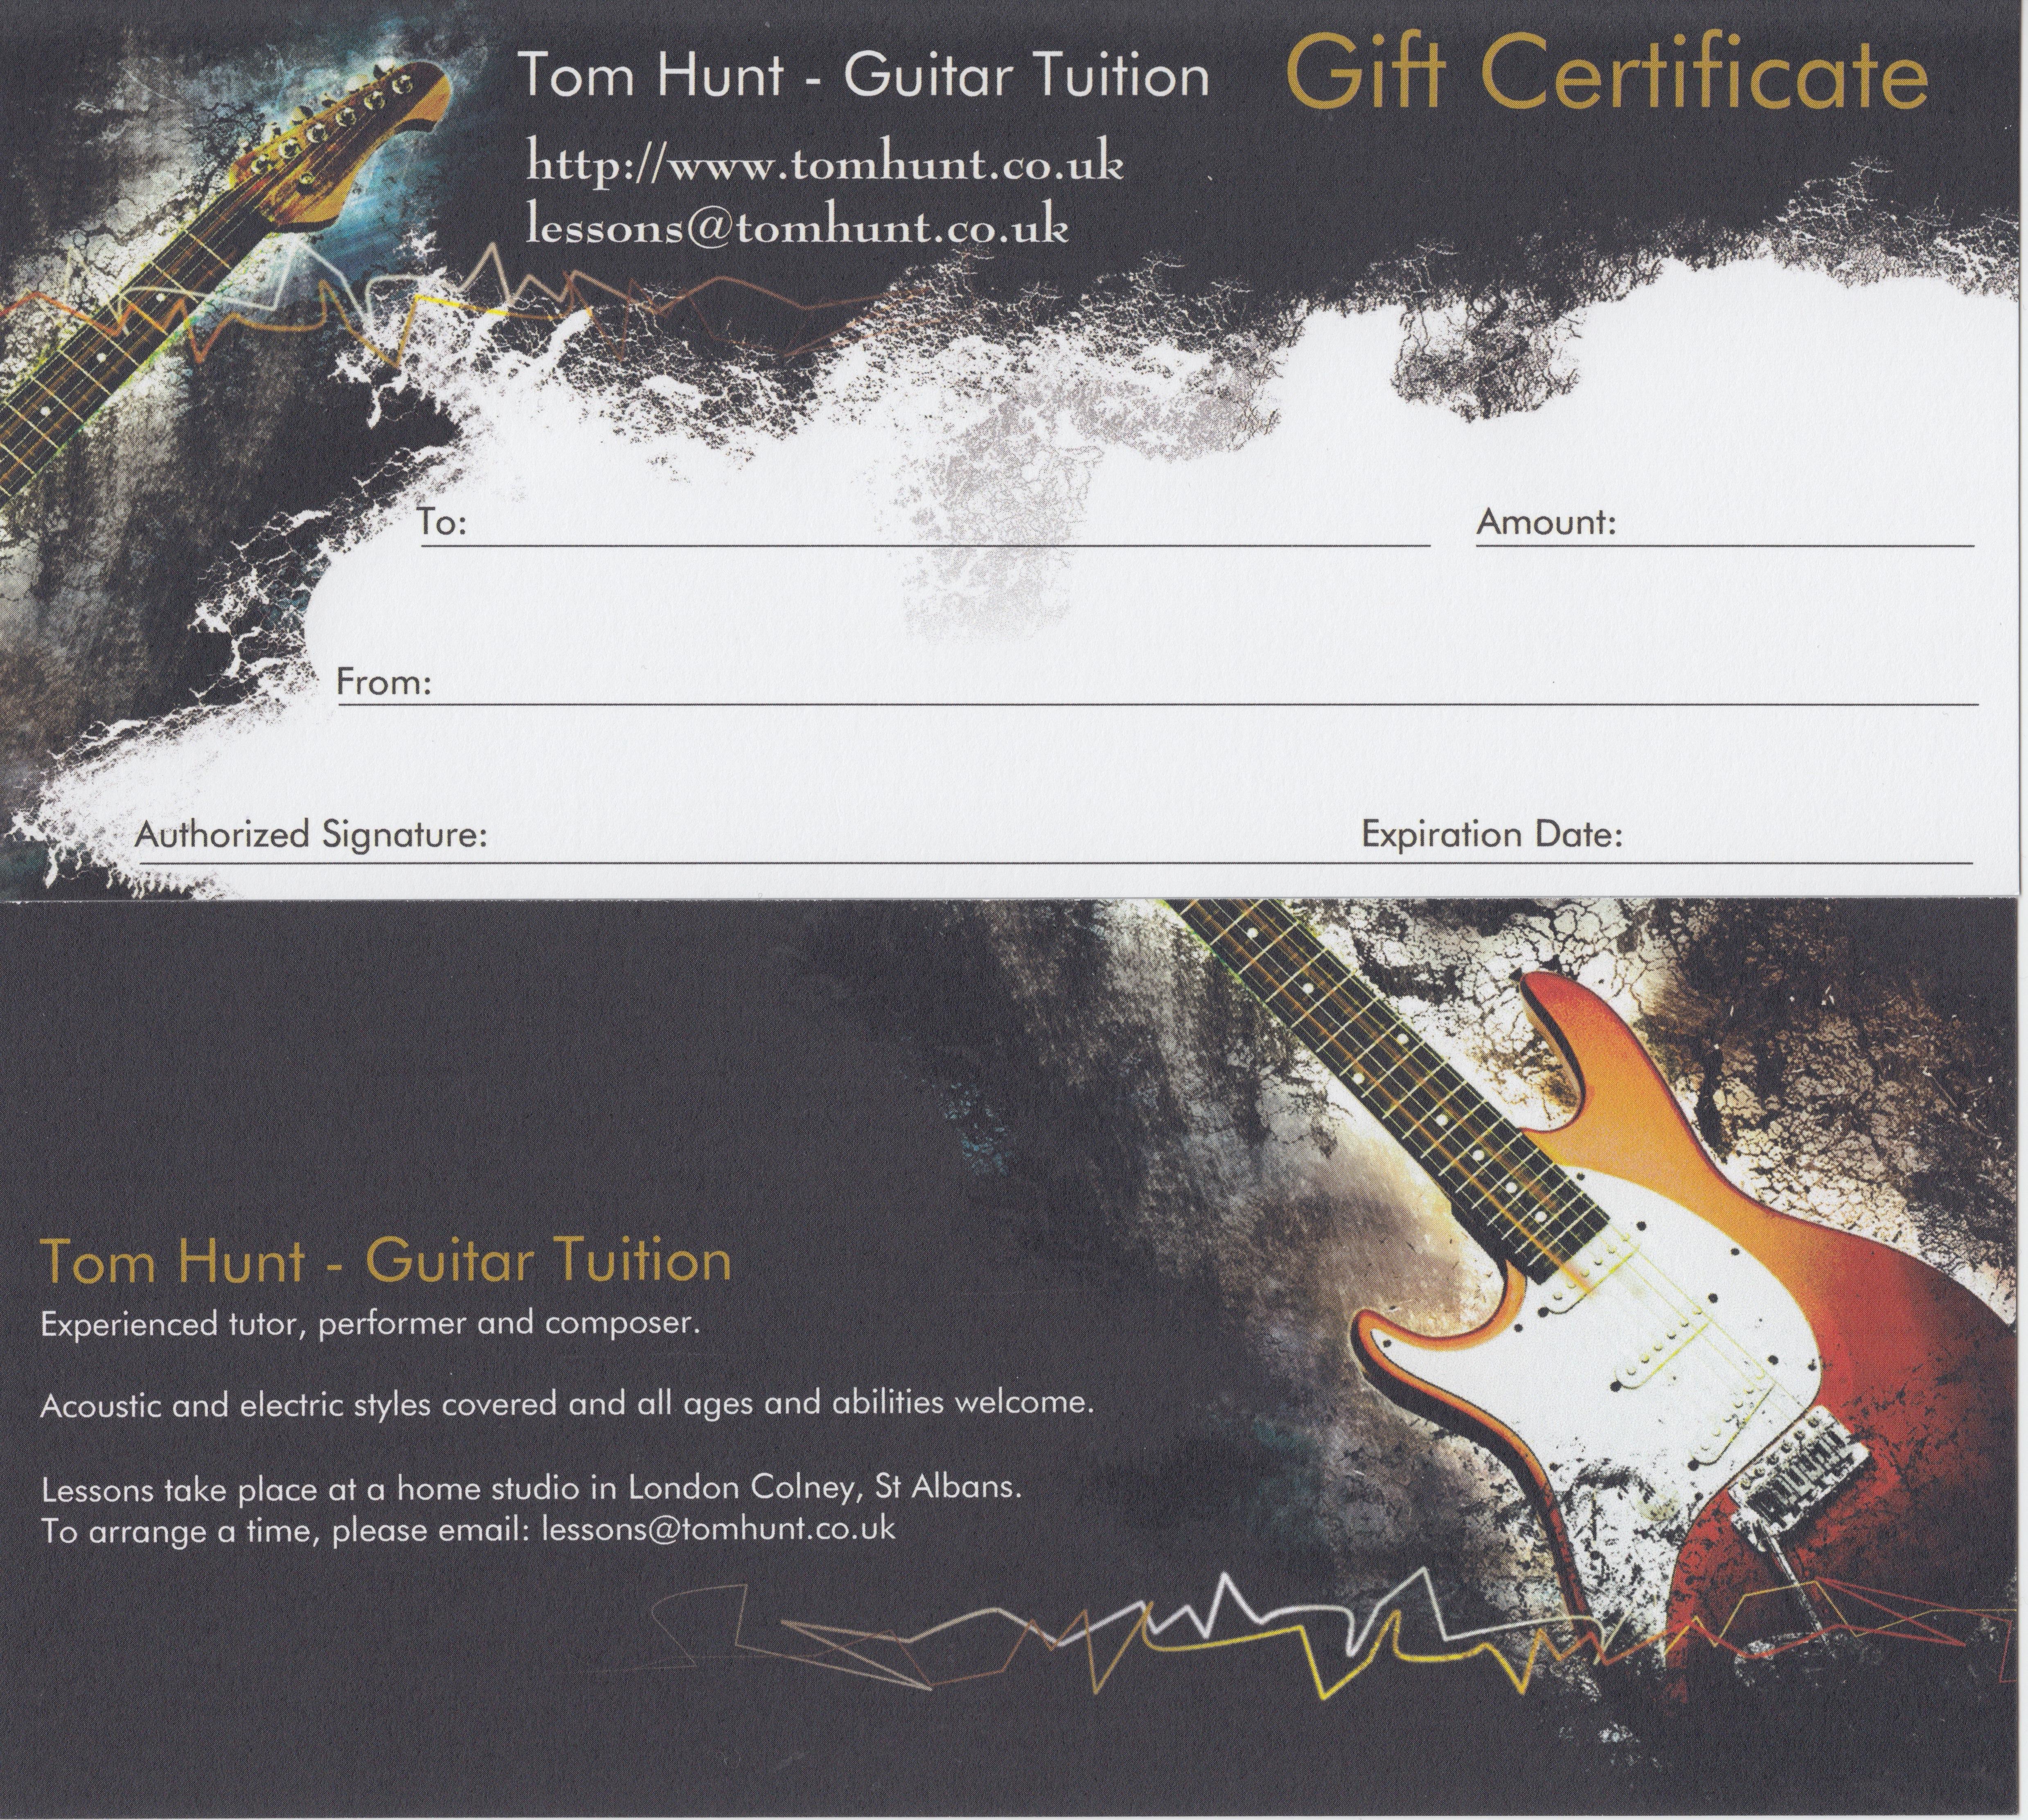 Tom Hunt Guitar gift vouchers